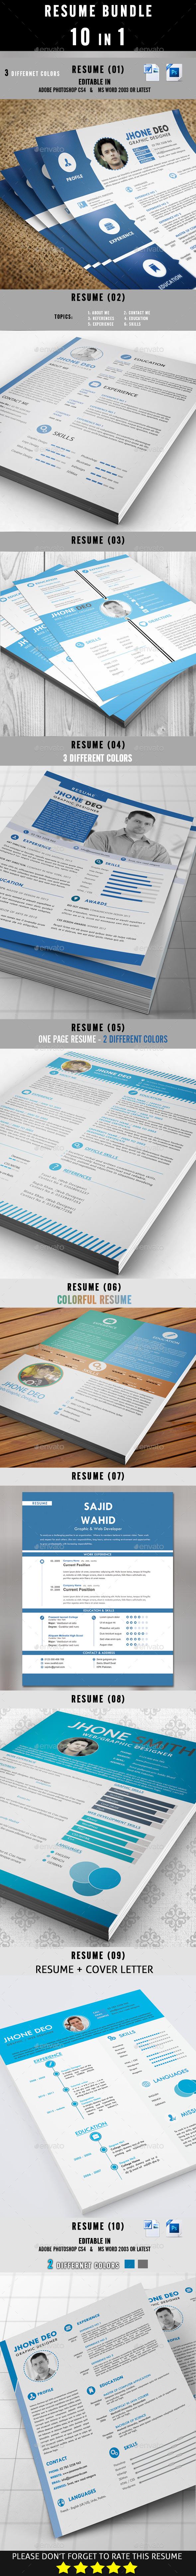 Resume Bundle 10 in 1 - Resumes Stationery